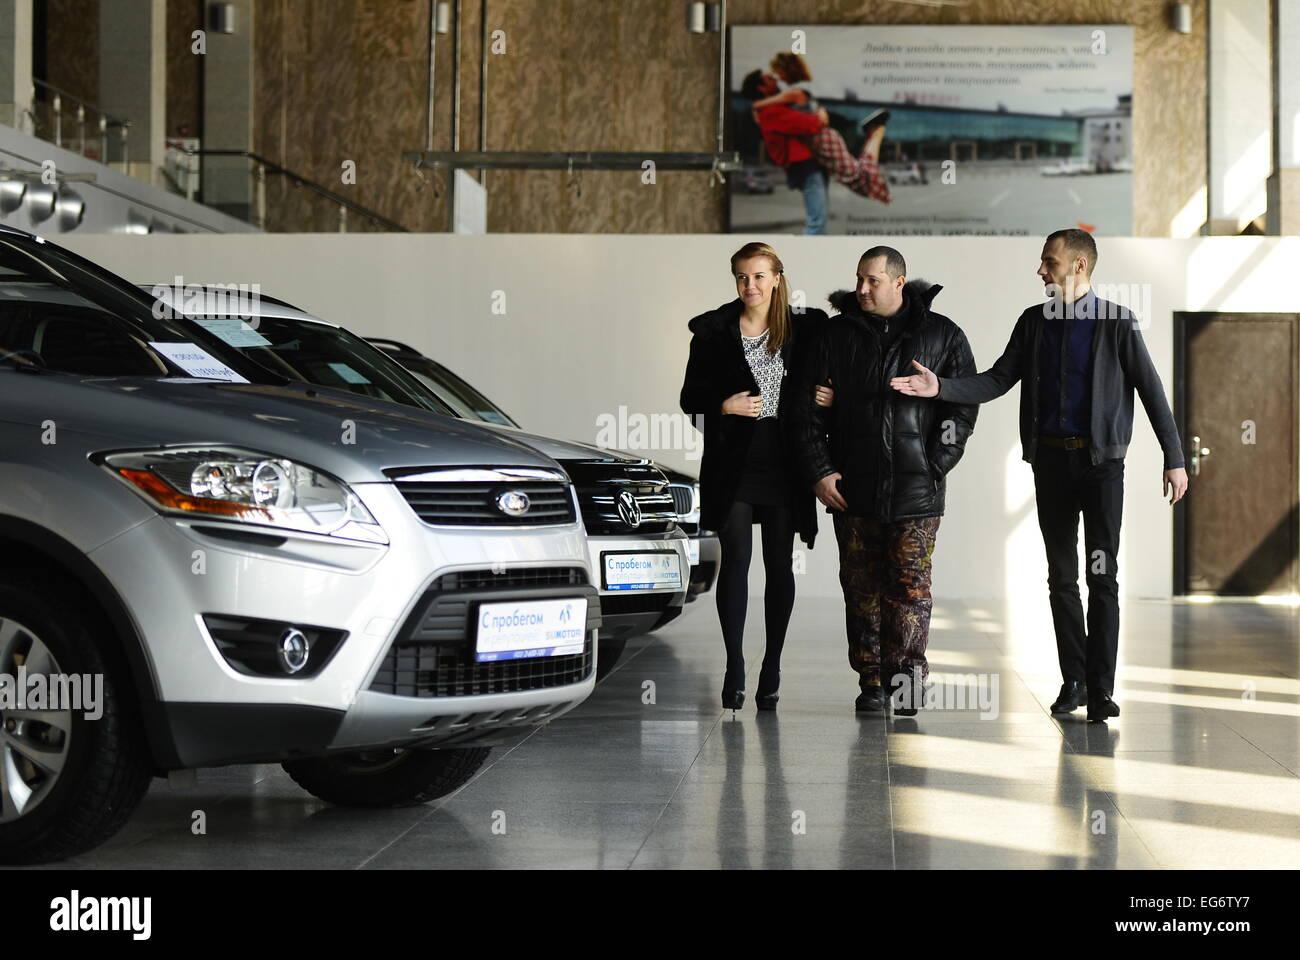 Vladivostok, Russia. 18th Feb, 2015. The Sumotori-Avtoport multi-functional car dealership in the former building - Stock Image